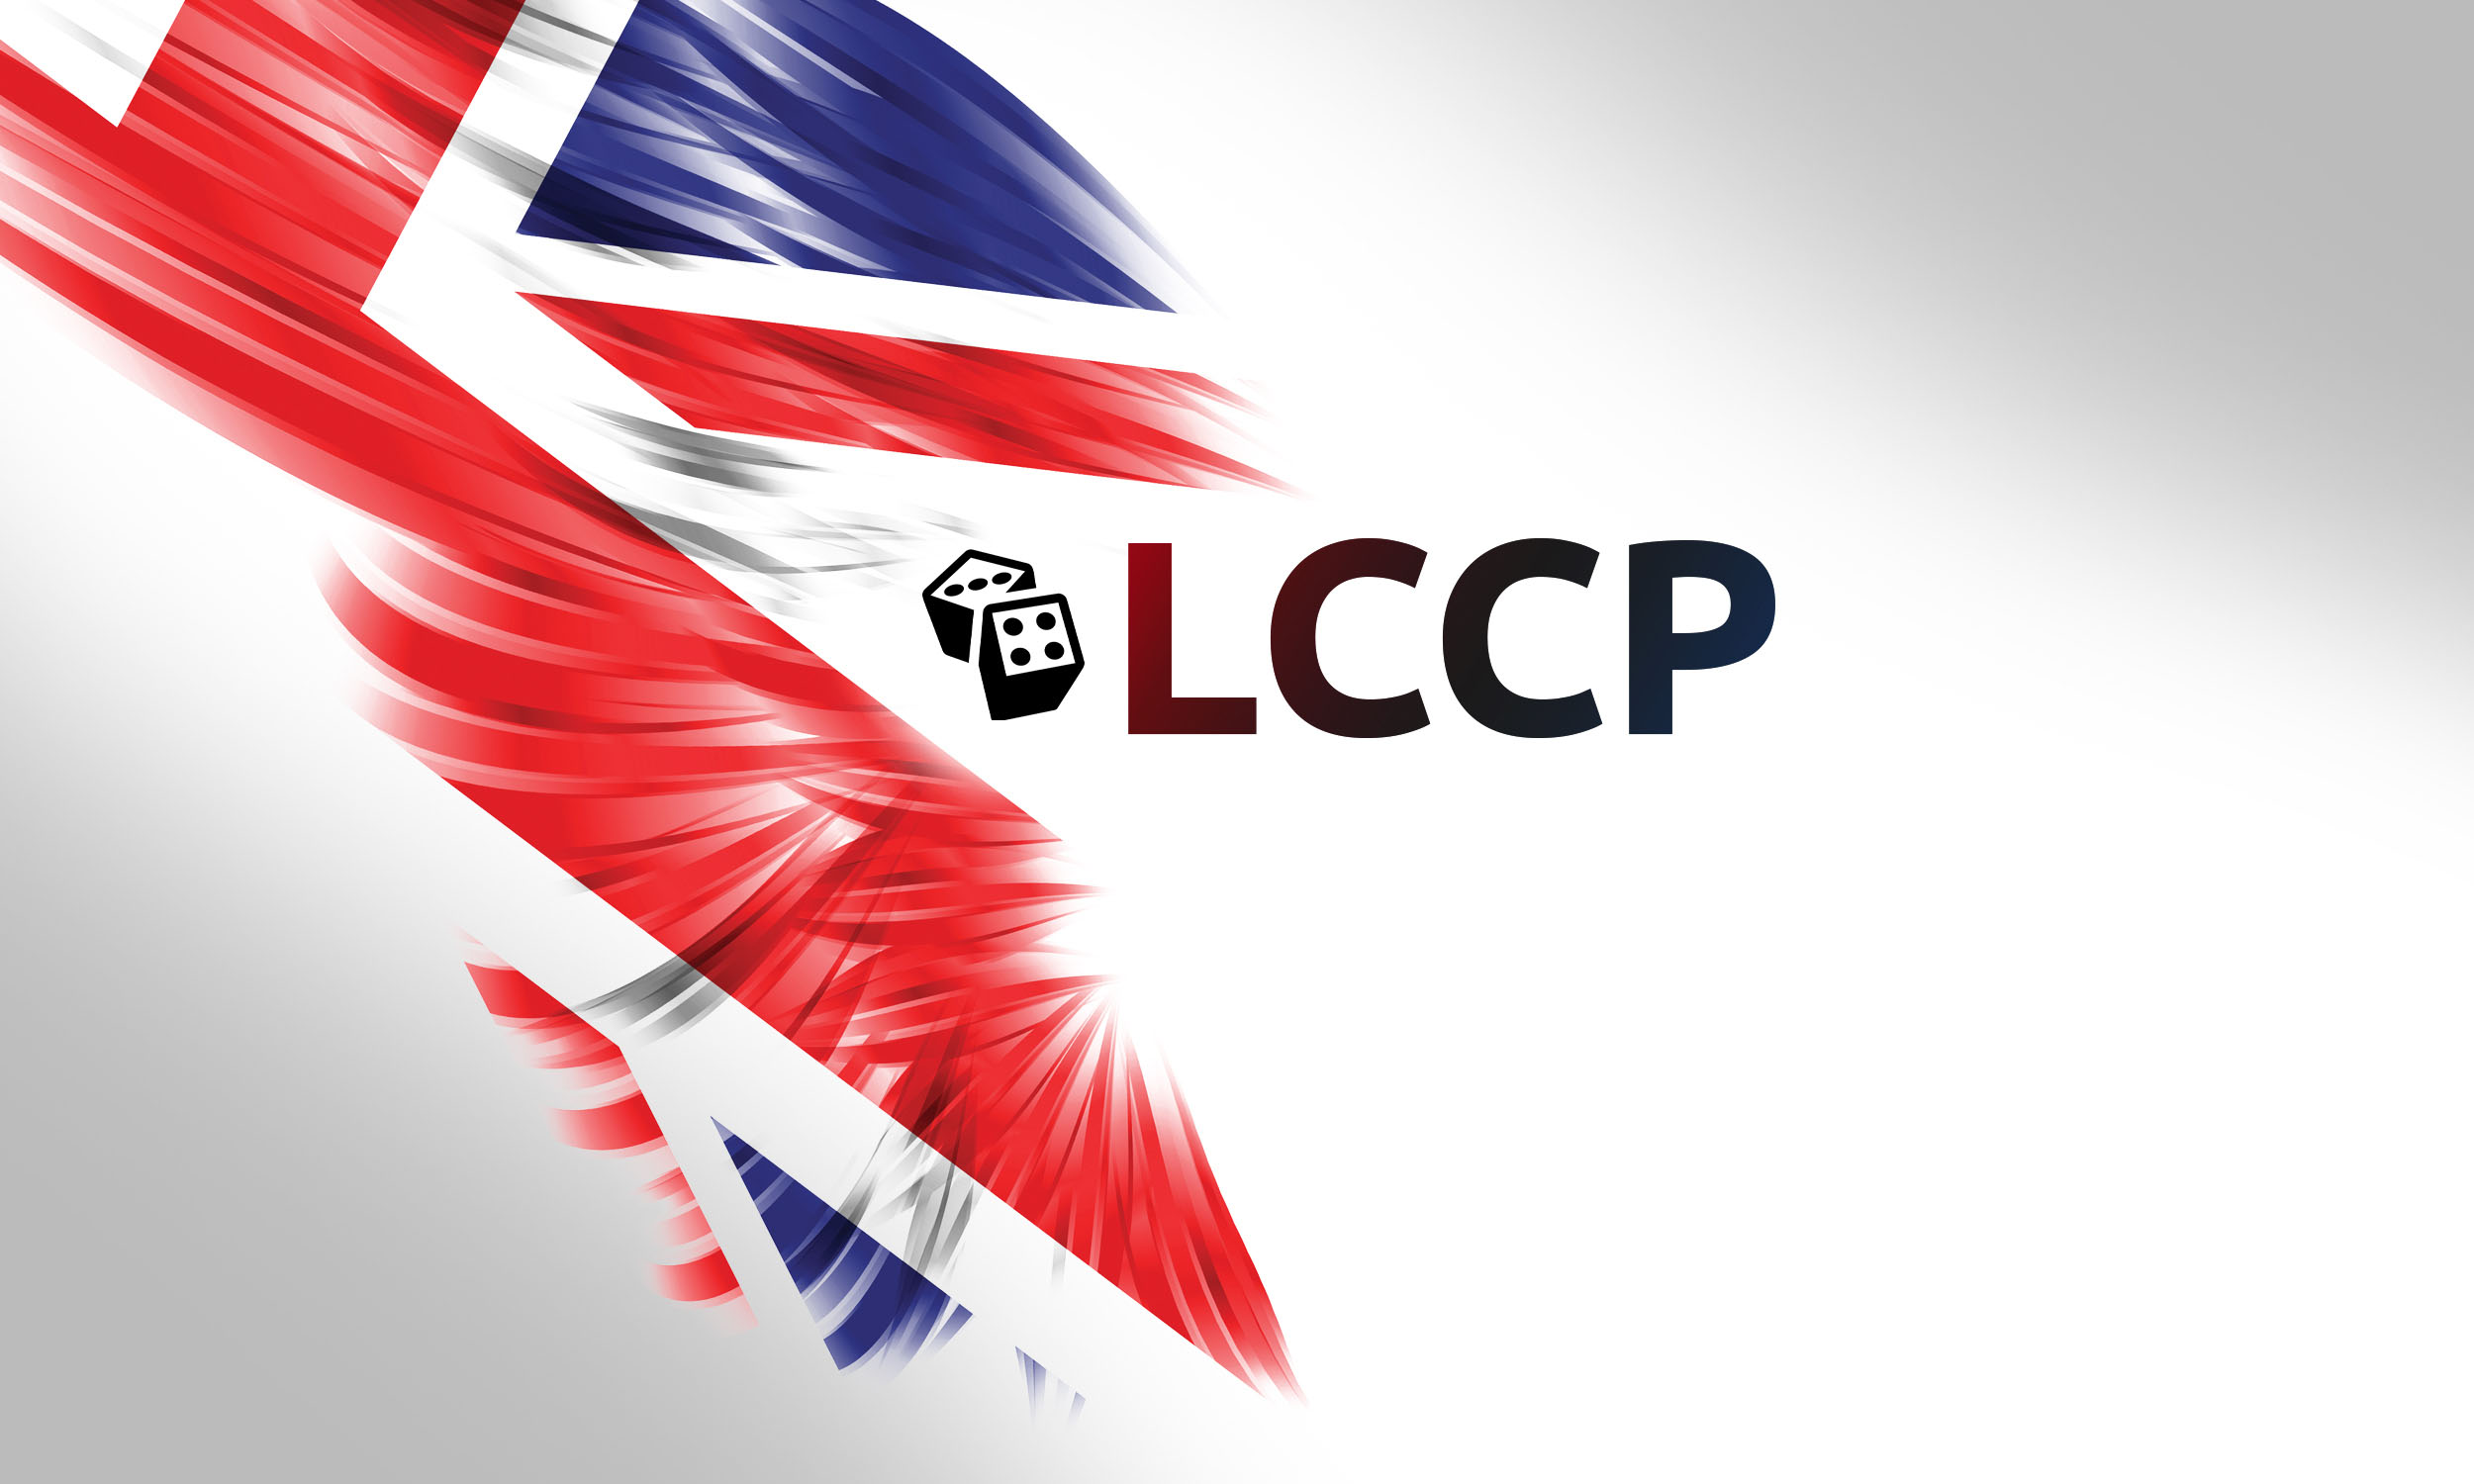 Non-Static LCCP: July 2020 Version And Upcoming Amendments